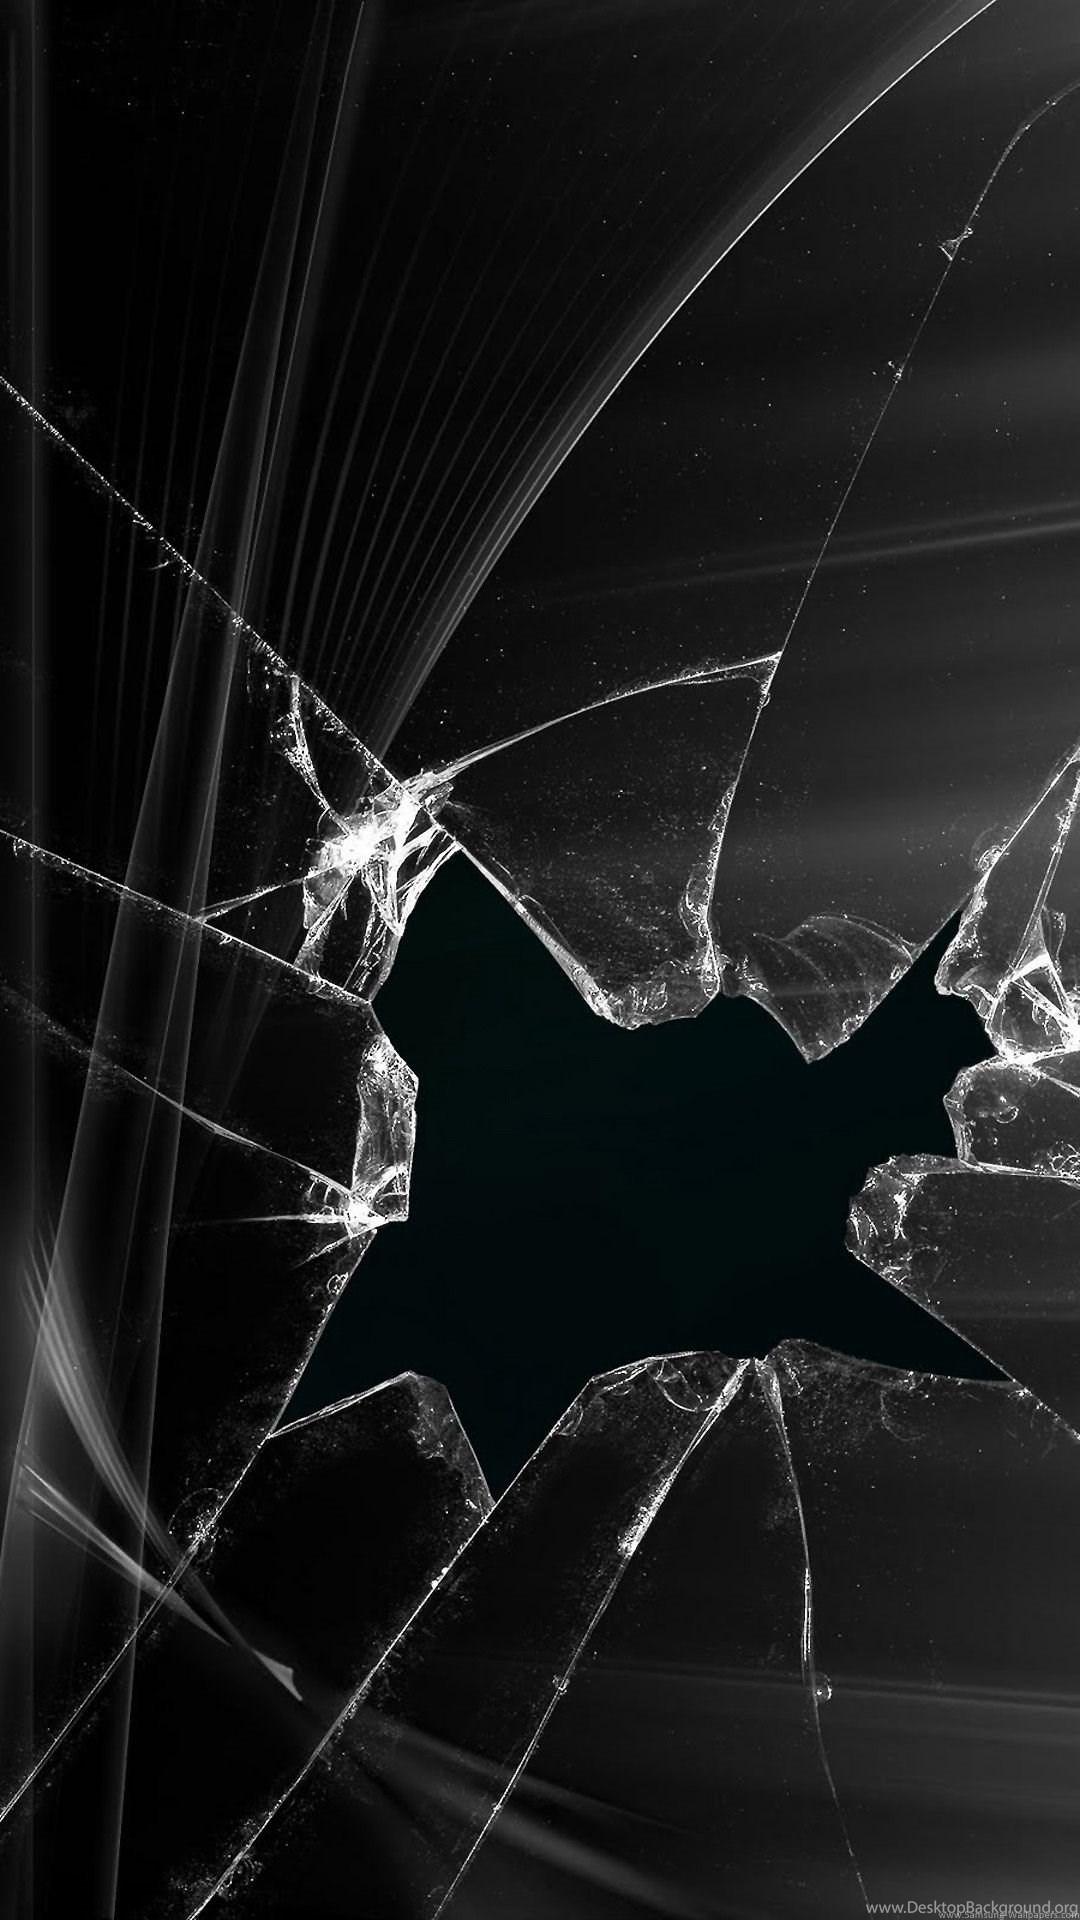 Broken Phone Screen Black Iphone 6 Plus 1080x1920 Wallpaper Jpg Desktop Background